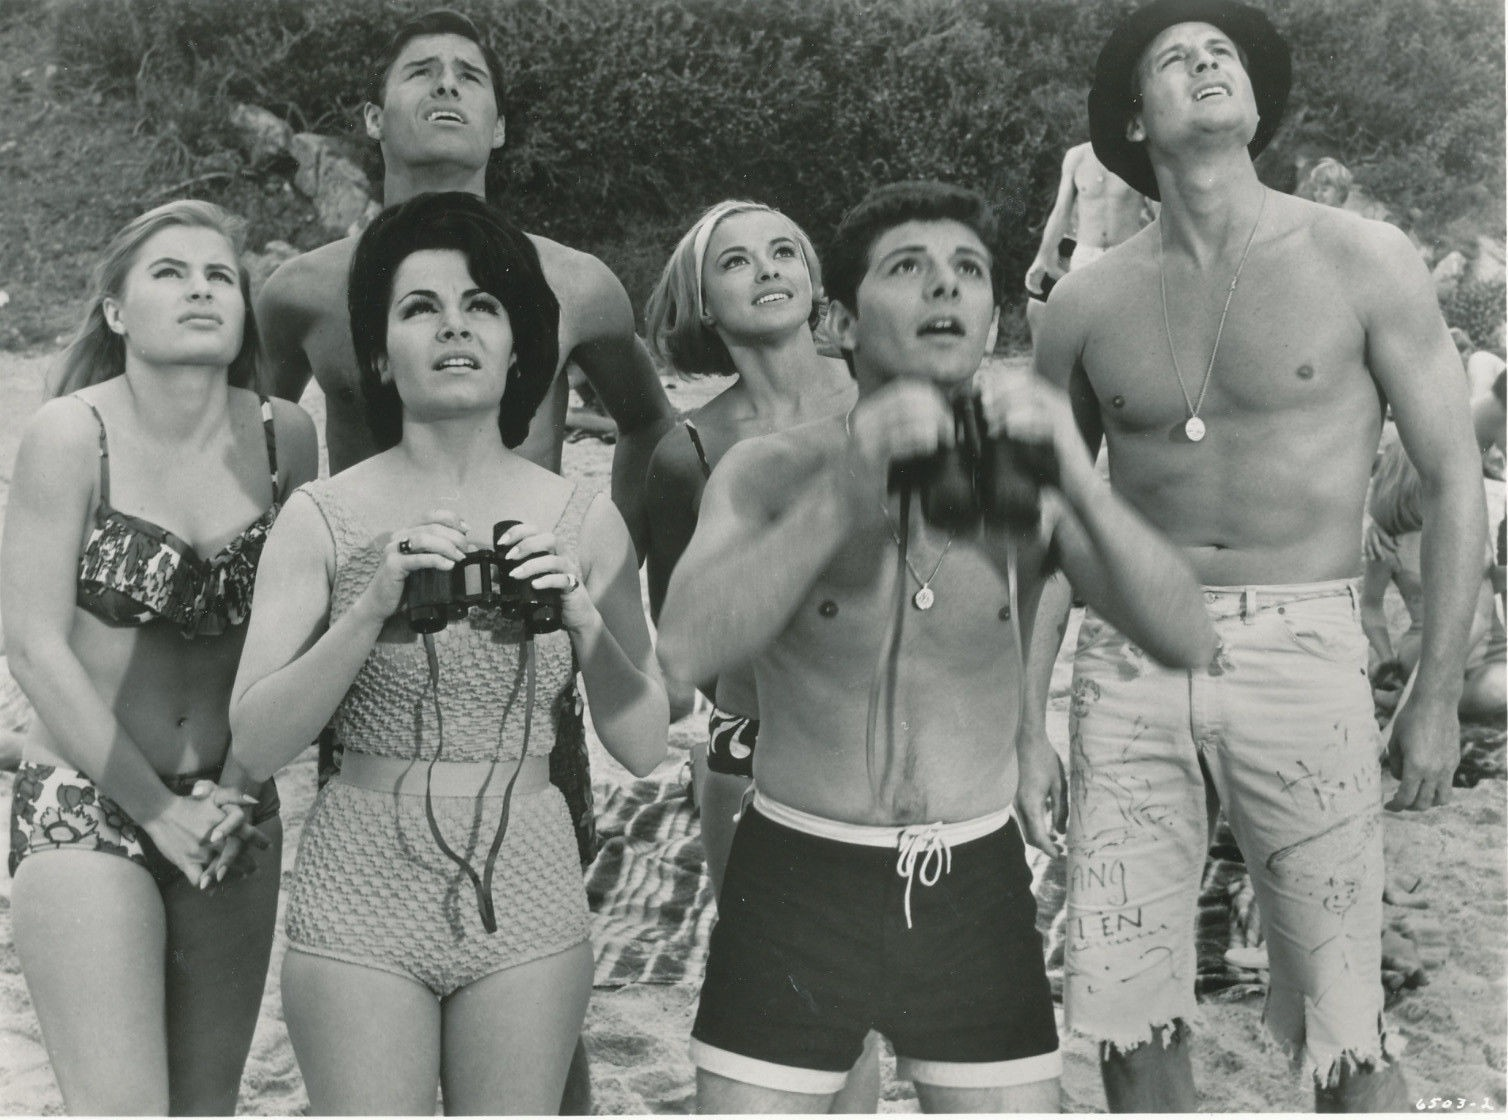 af94dfd1fd21 Watching the Beach Blanket Bingo skydivers – Beach Party Movies